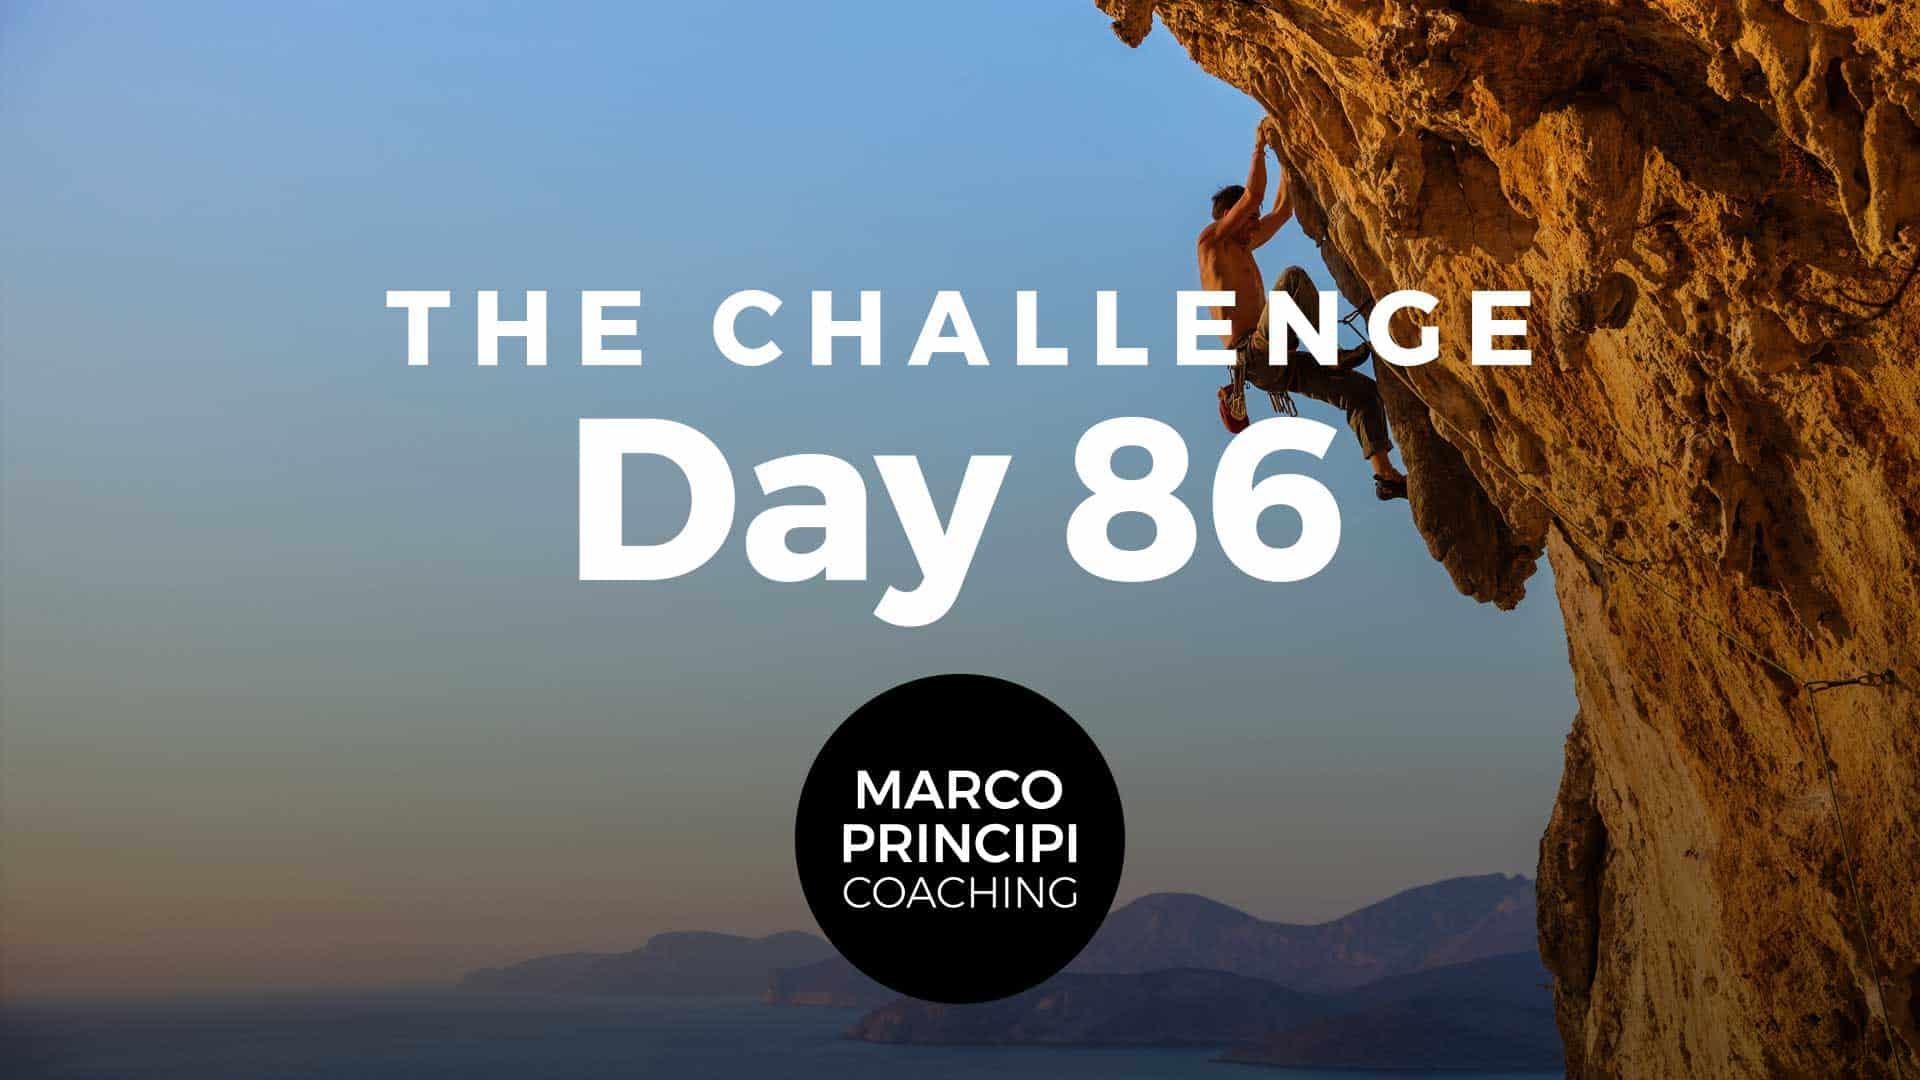 Marco Principi Coaching Challenge Day 86